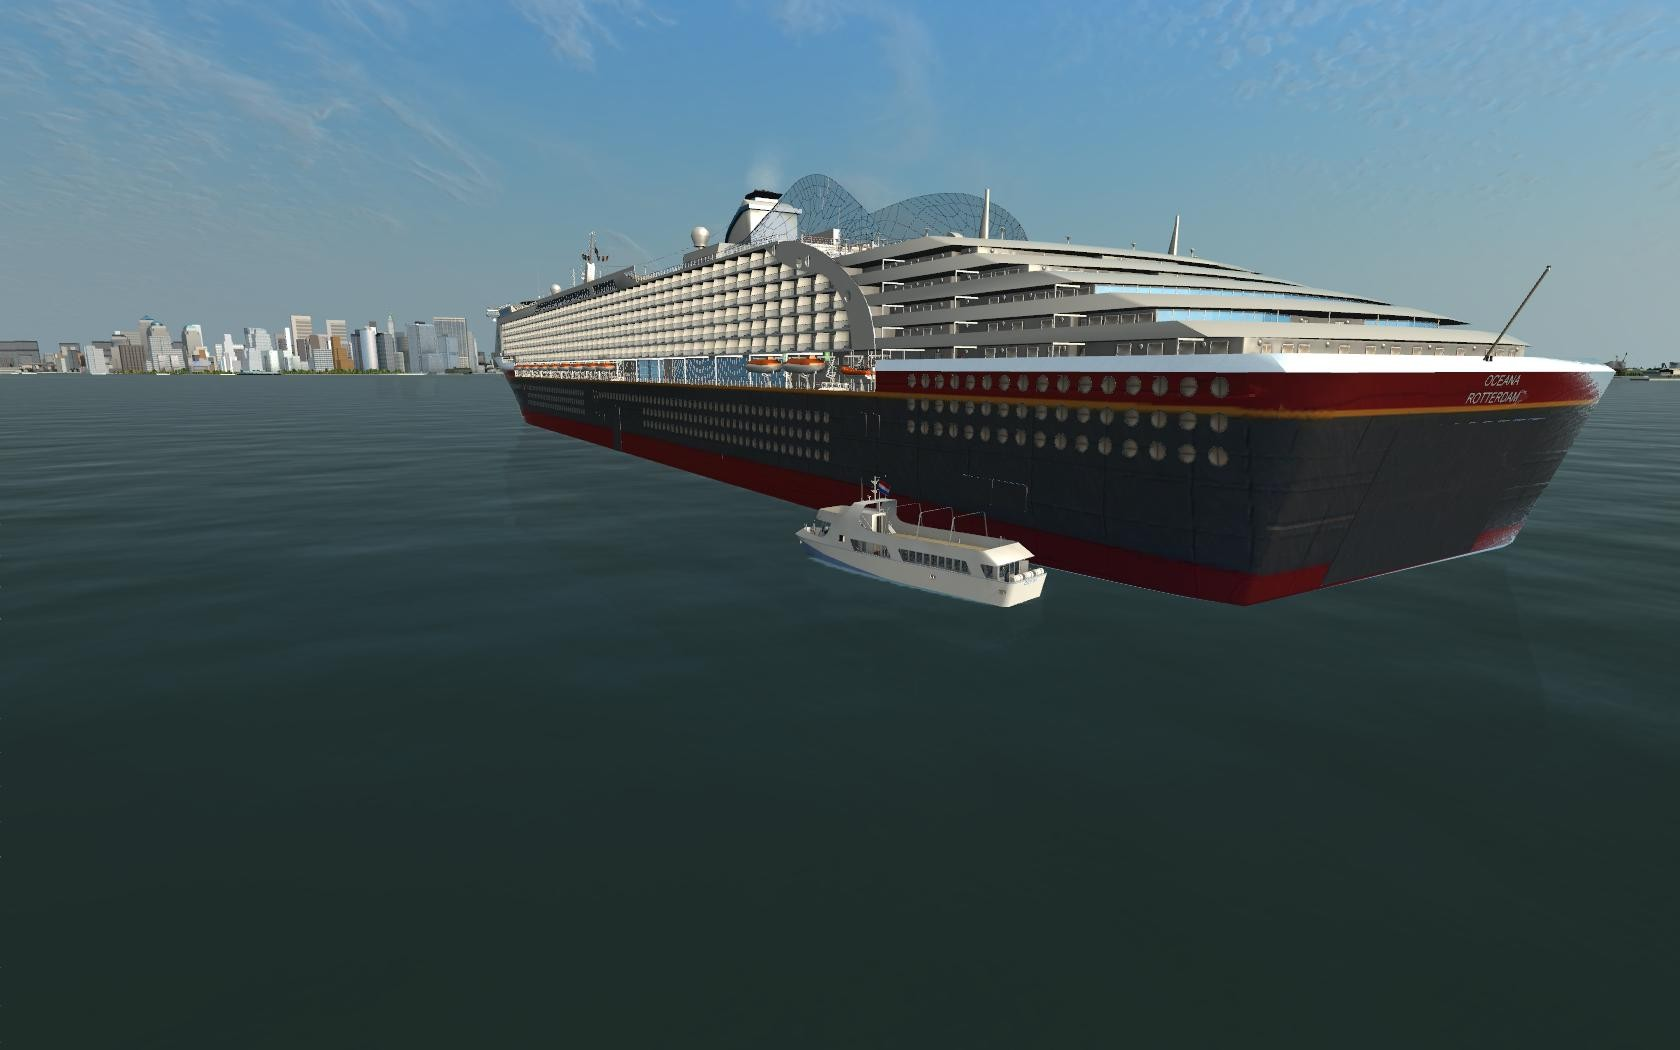 Buy Ship Simulator Extremes Oceana Cruise Ship DLC Steam Key - Oceana cruise lines